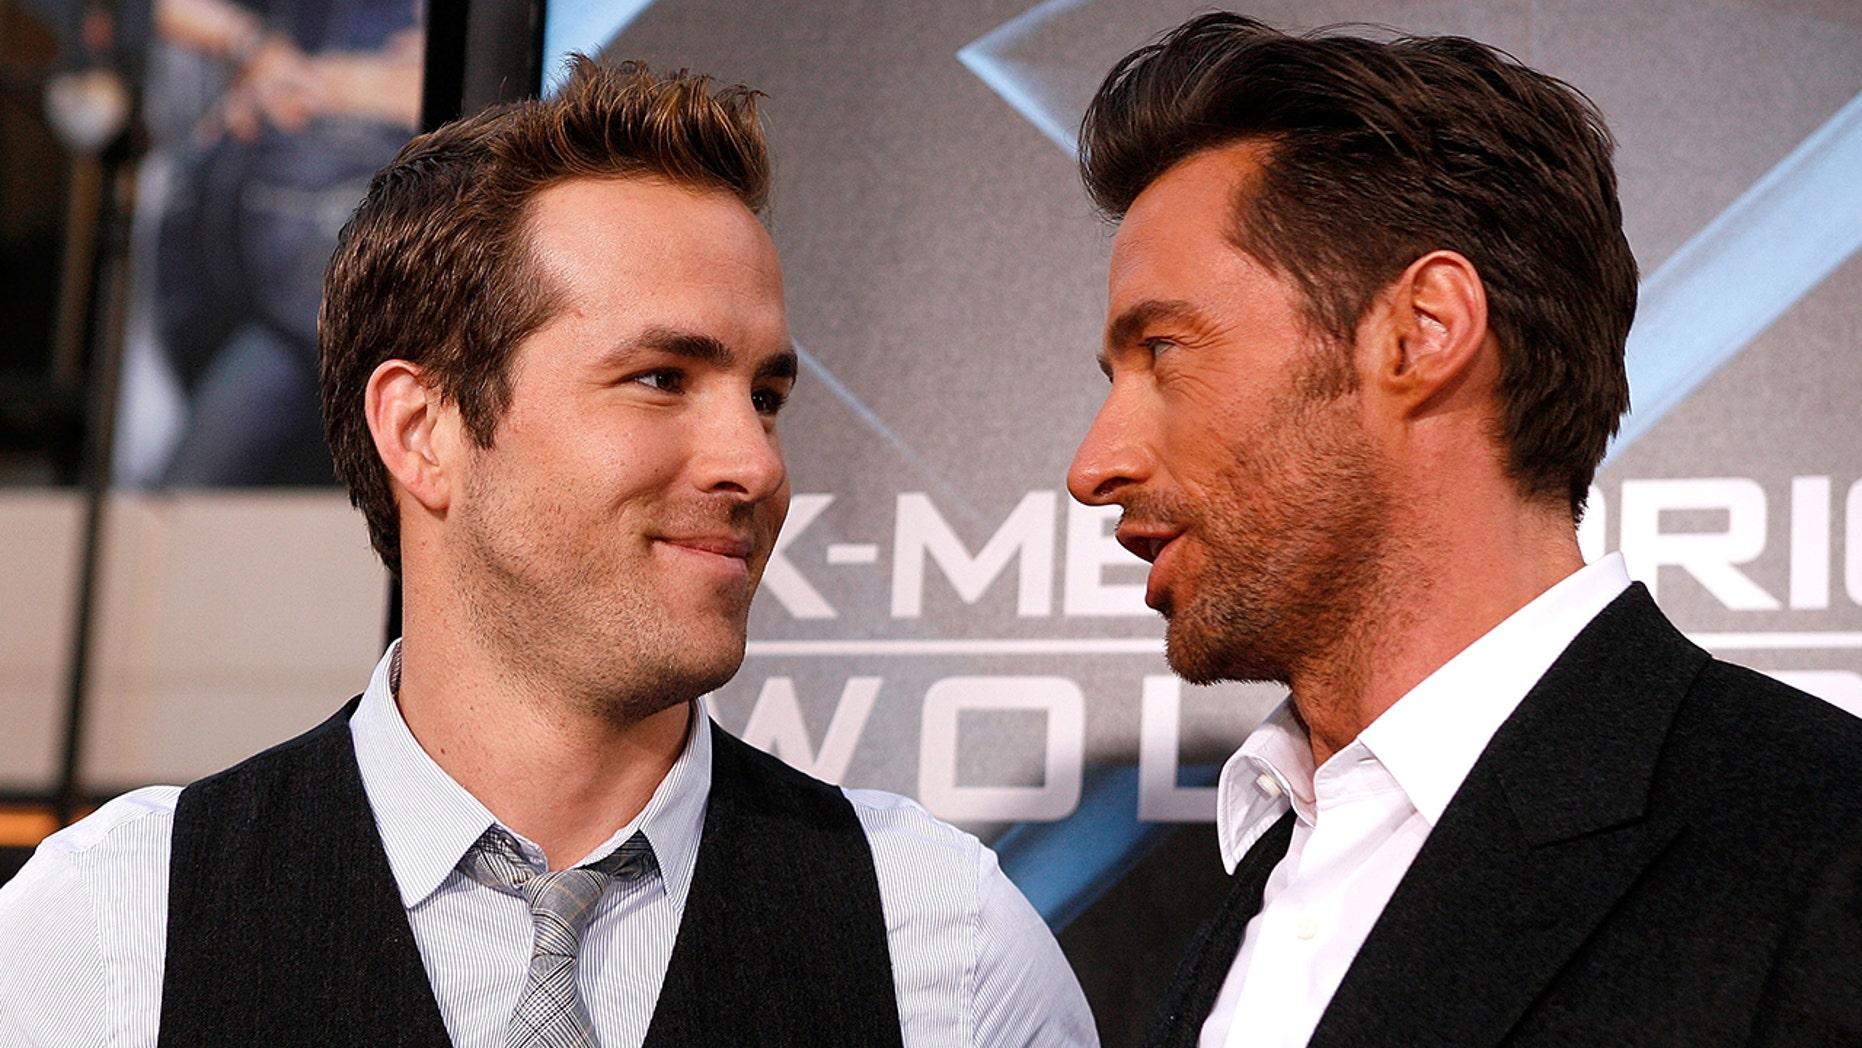 Ryan Reynolds and Hugh Jackman call a truce to their fake feud.